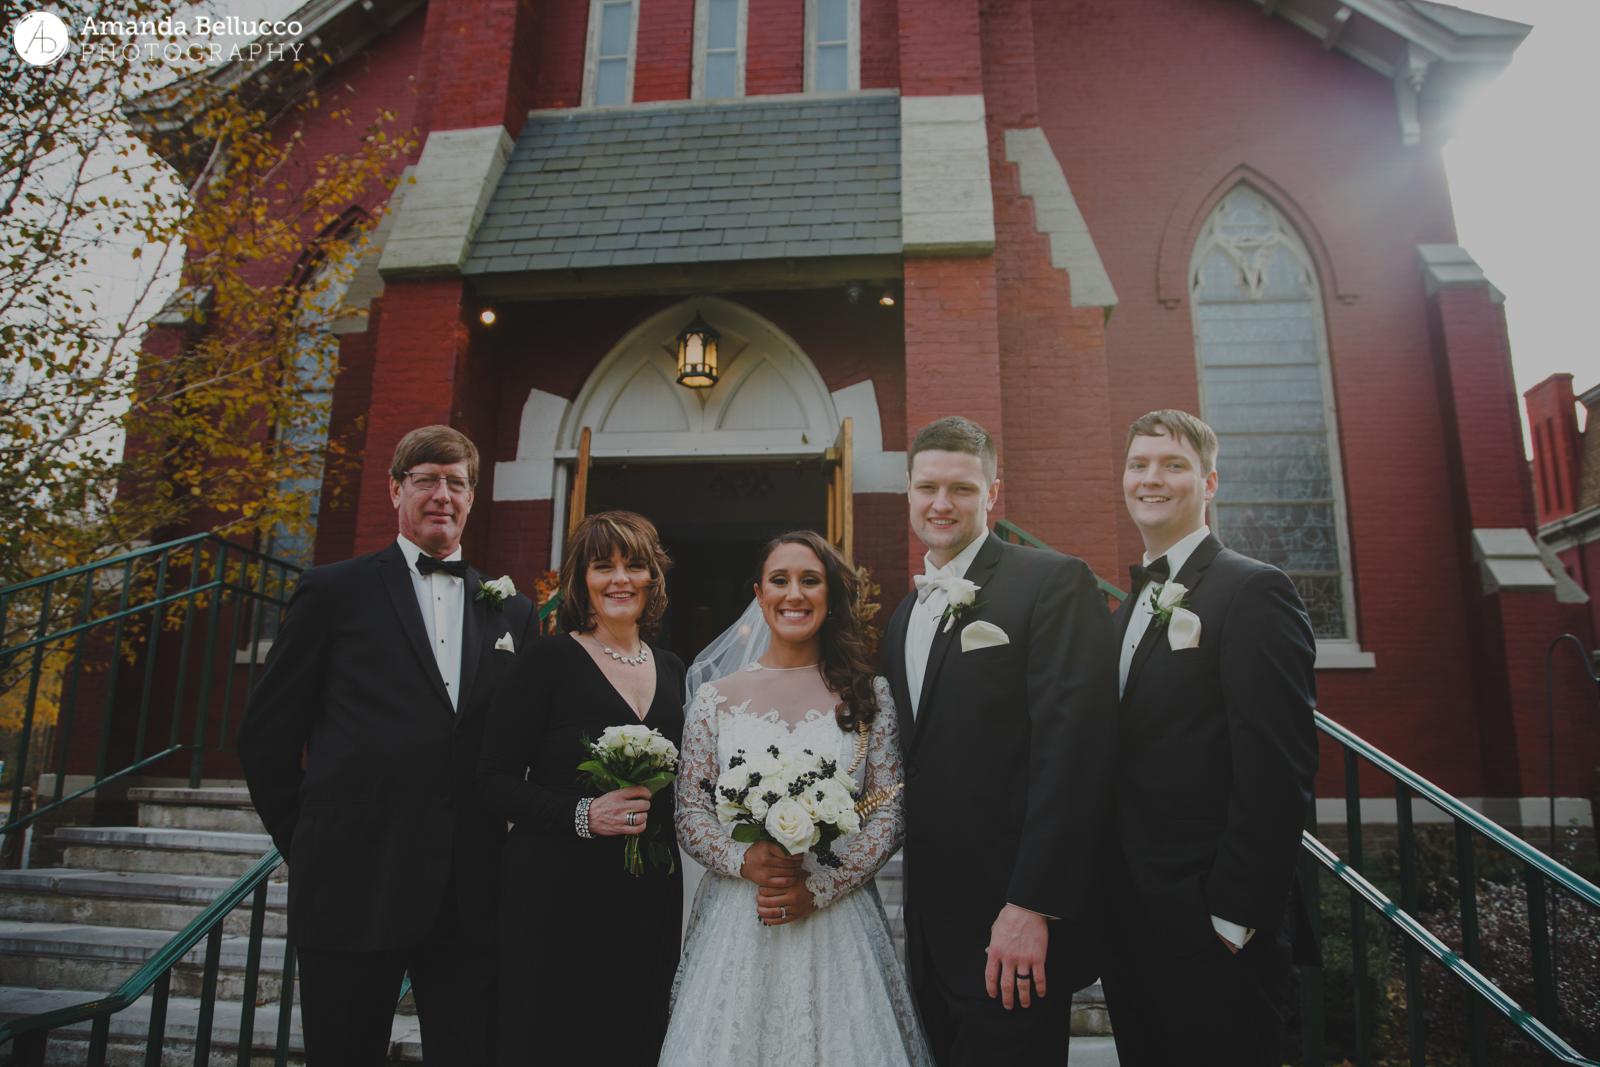 syracuse-rochester-fine-art-wedding-photographer-49.JPG